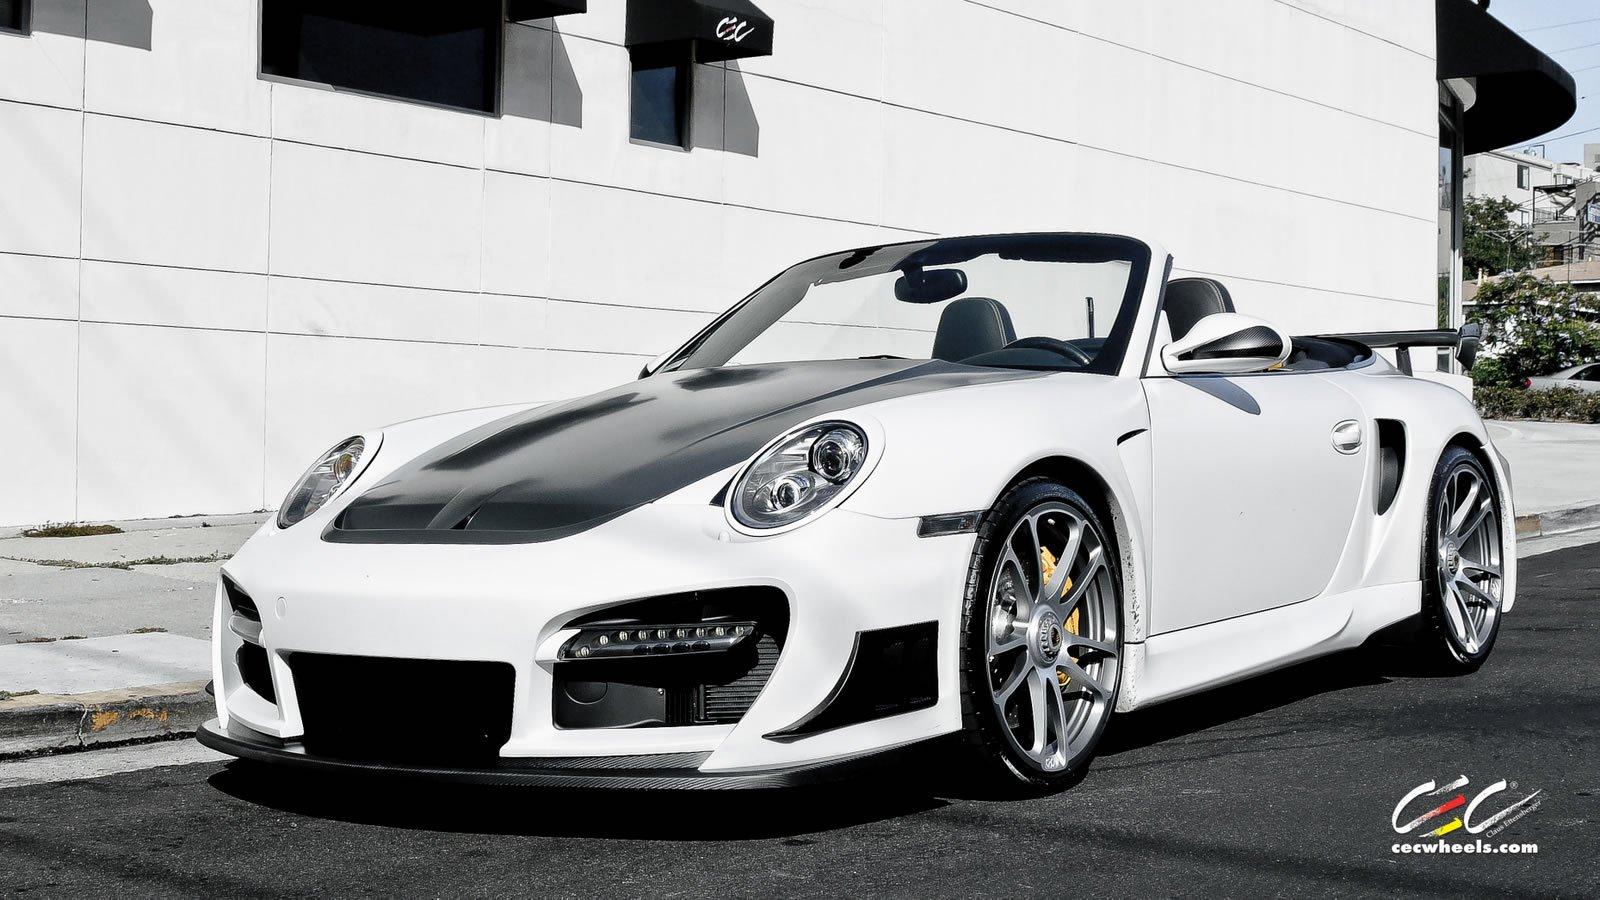 2015 cars cec tuning wheels porsche 911 turbo s cabriolet convertible wallpaper 1600x900. Black Bedroom Furniture Sets. Home Design Ideas